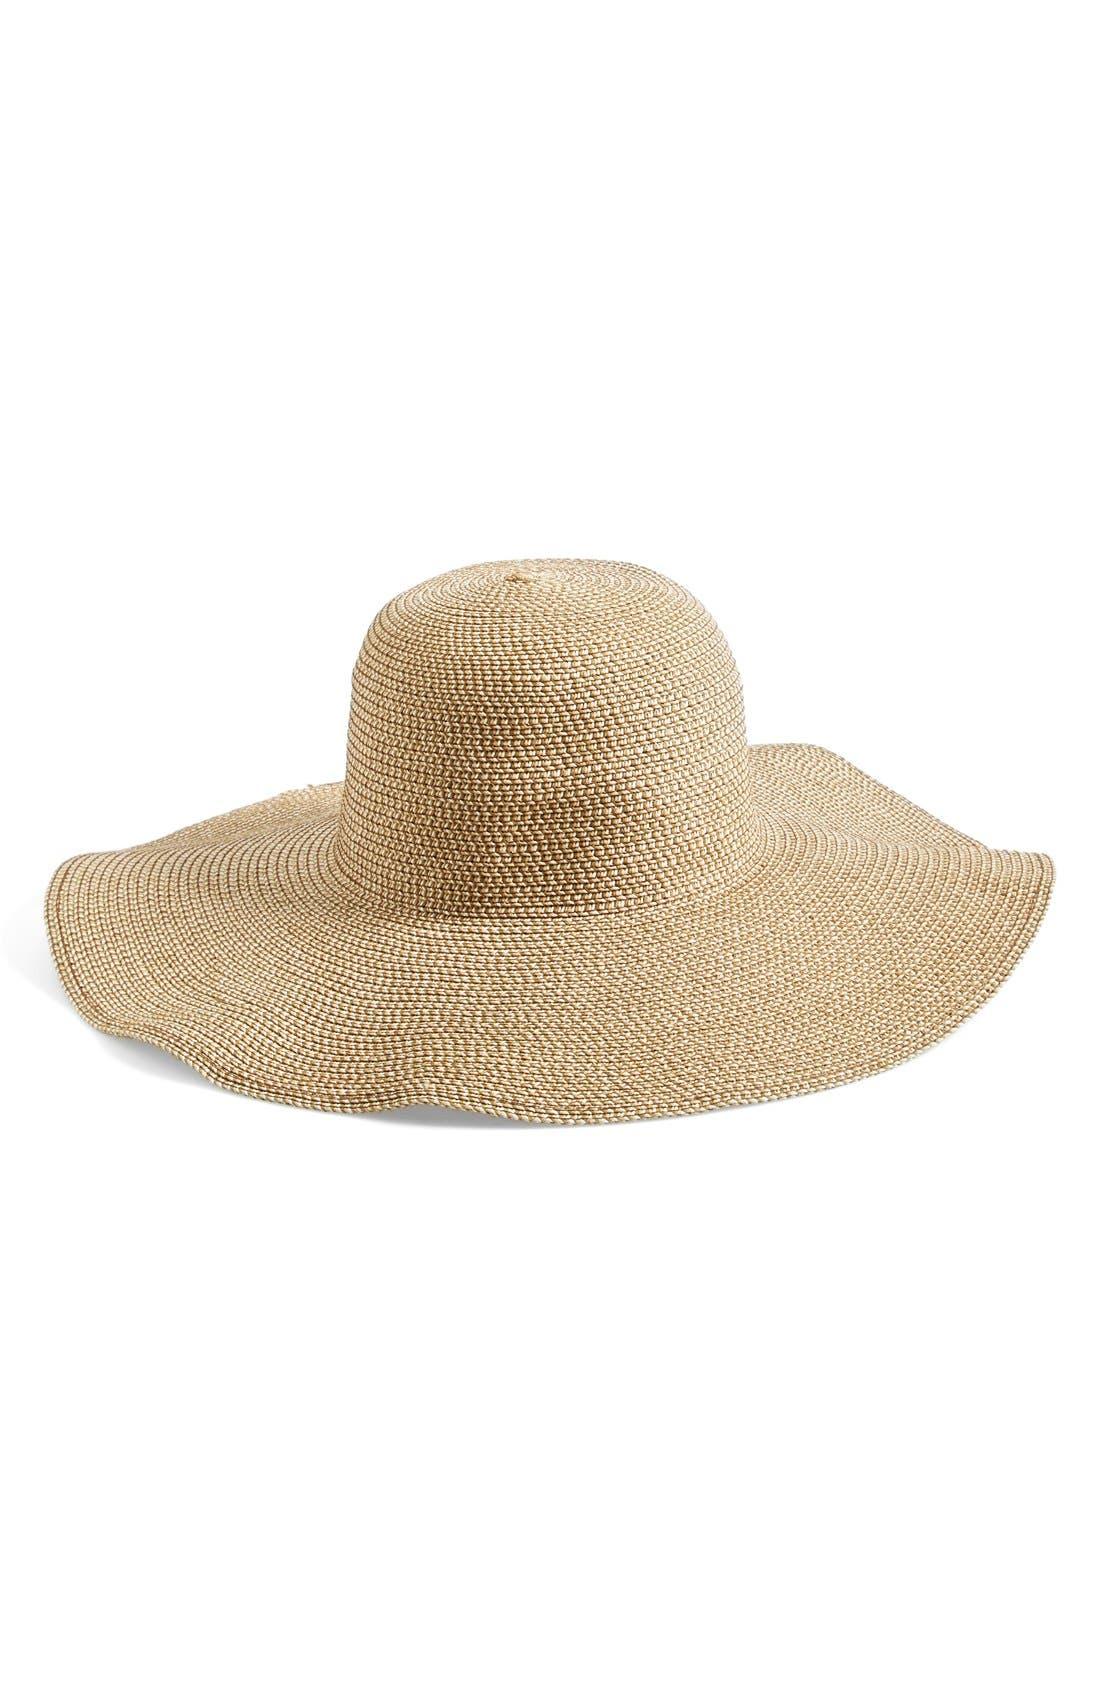 Main Image - BP. Floppy Straw Look Hat